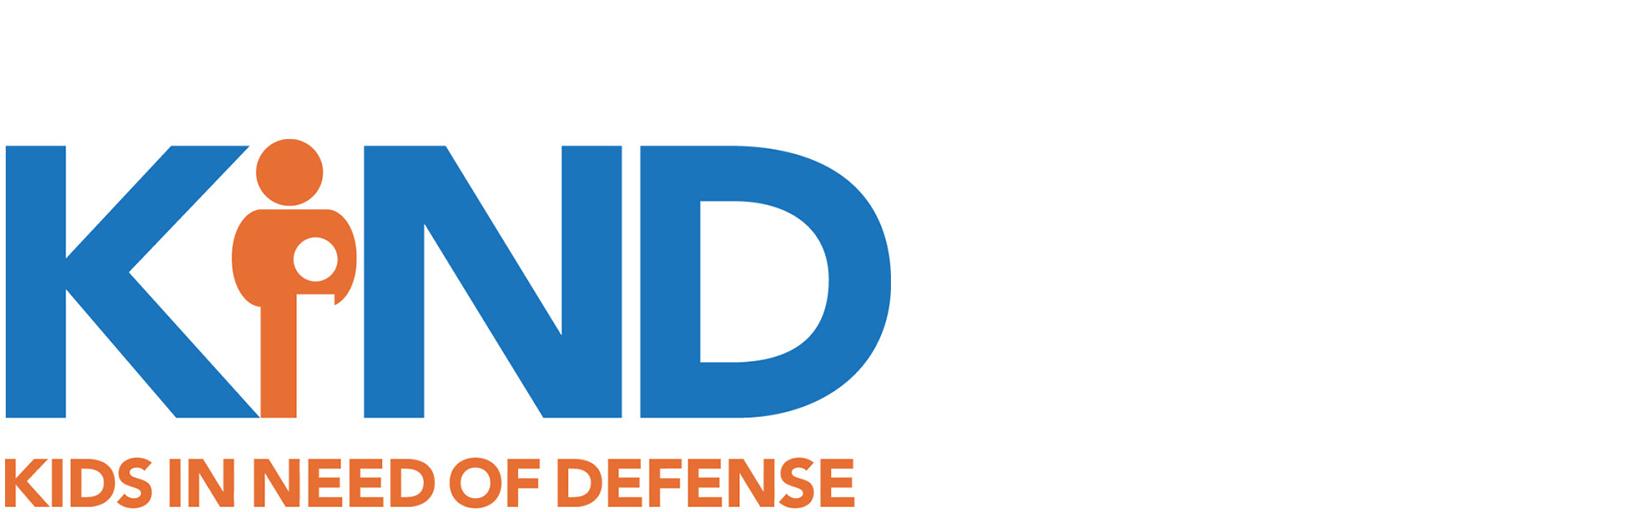 Kids in Need of Defense